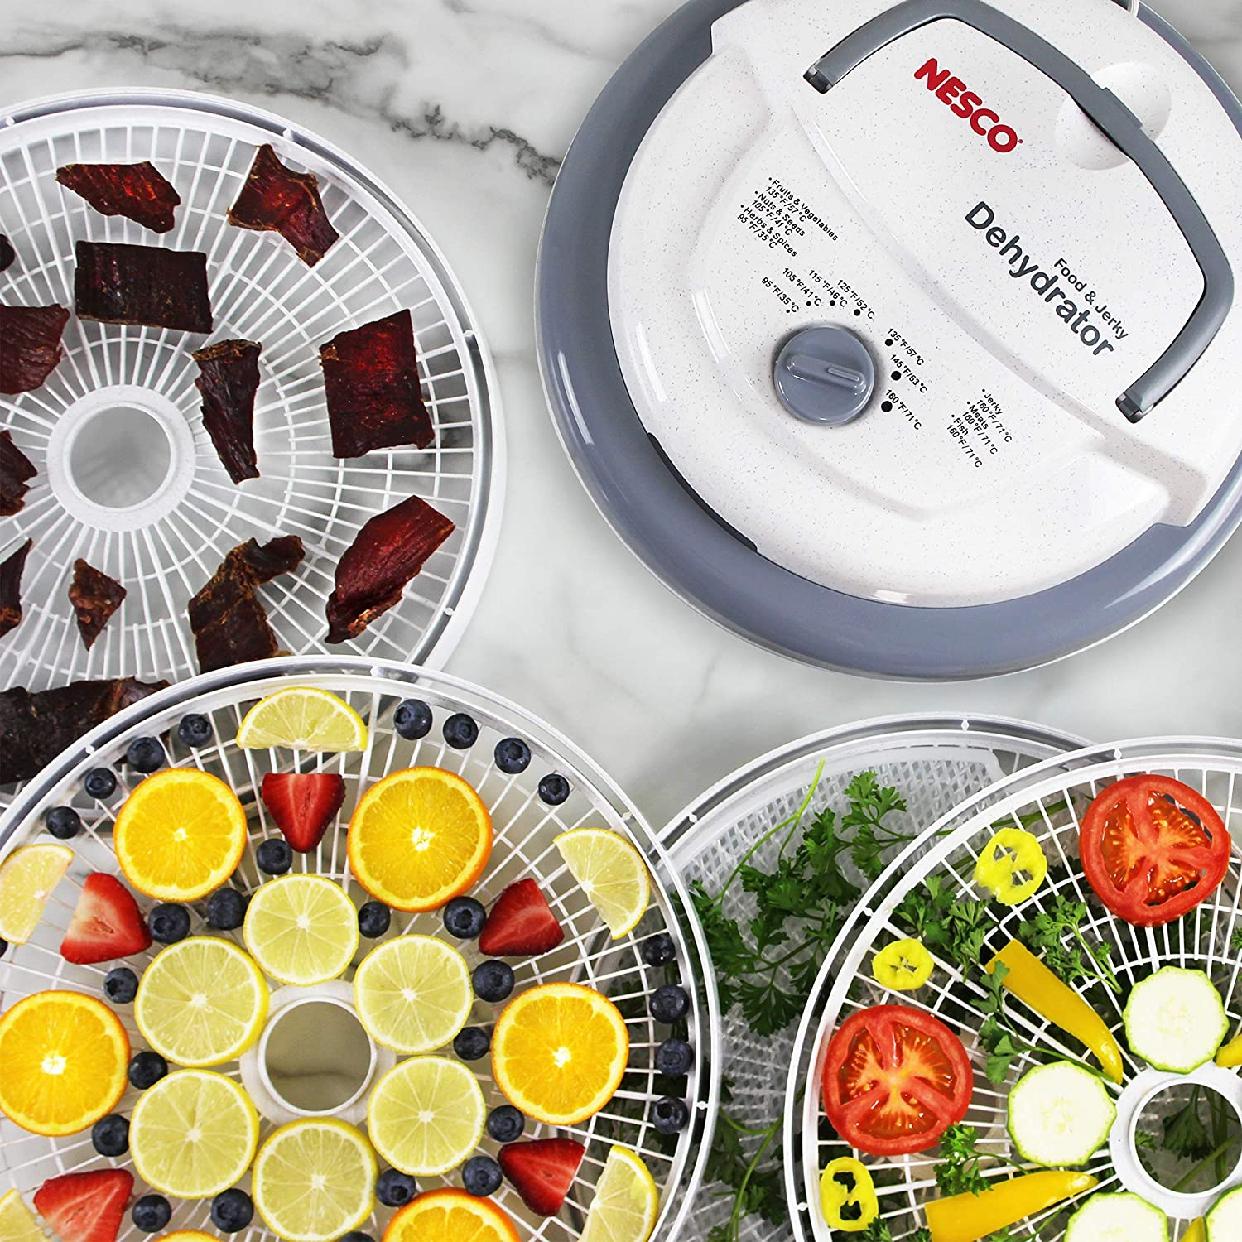 Nesco(ネスコ)スナックマスター 食品乾燥機 FD-75A【並行輸入】の商品画像9